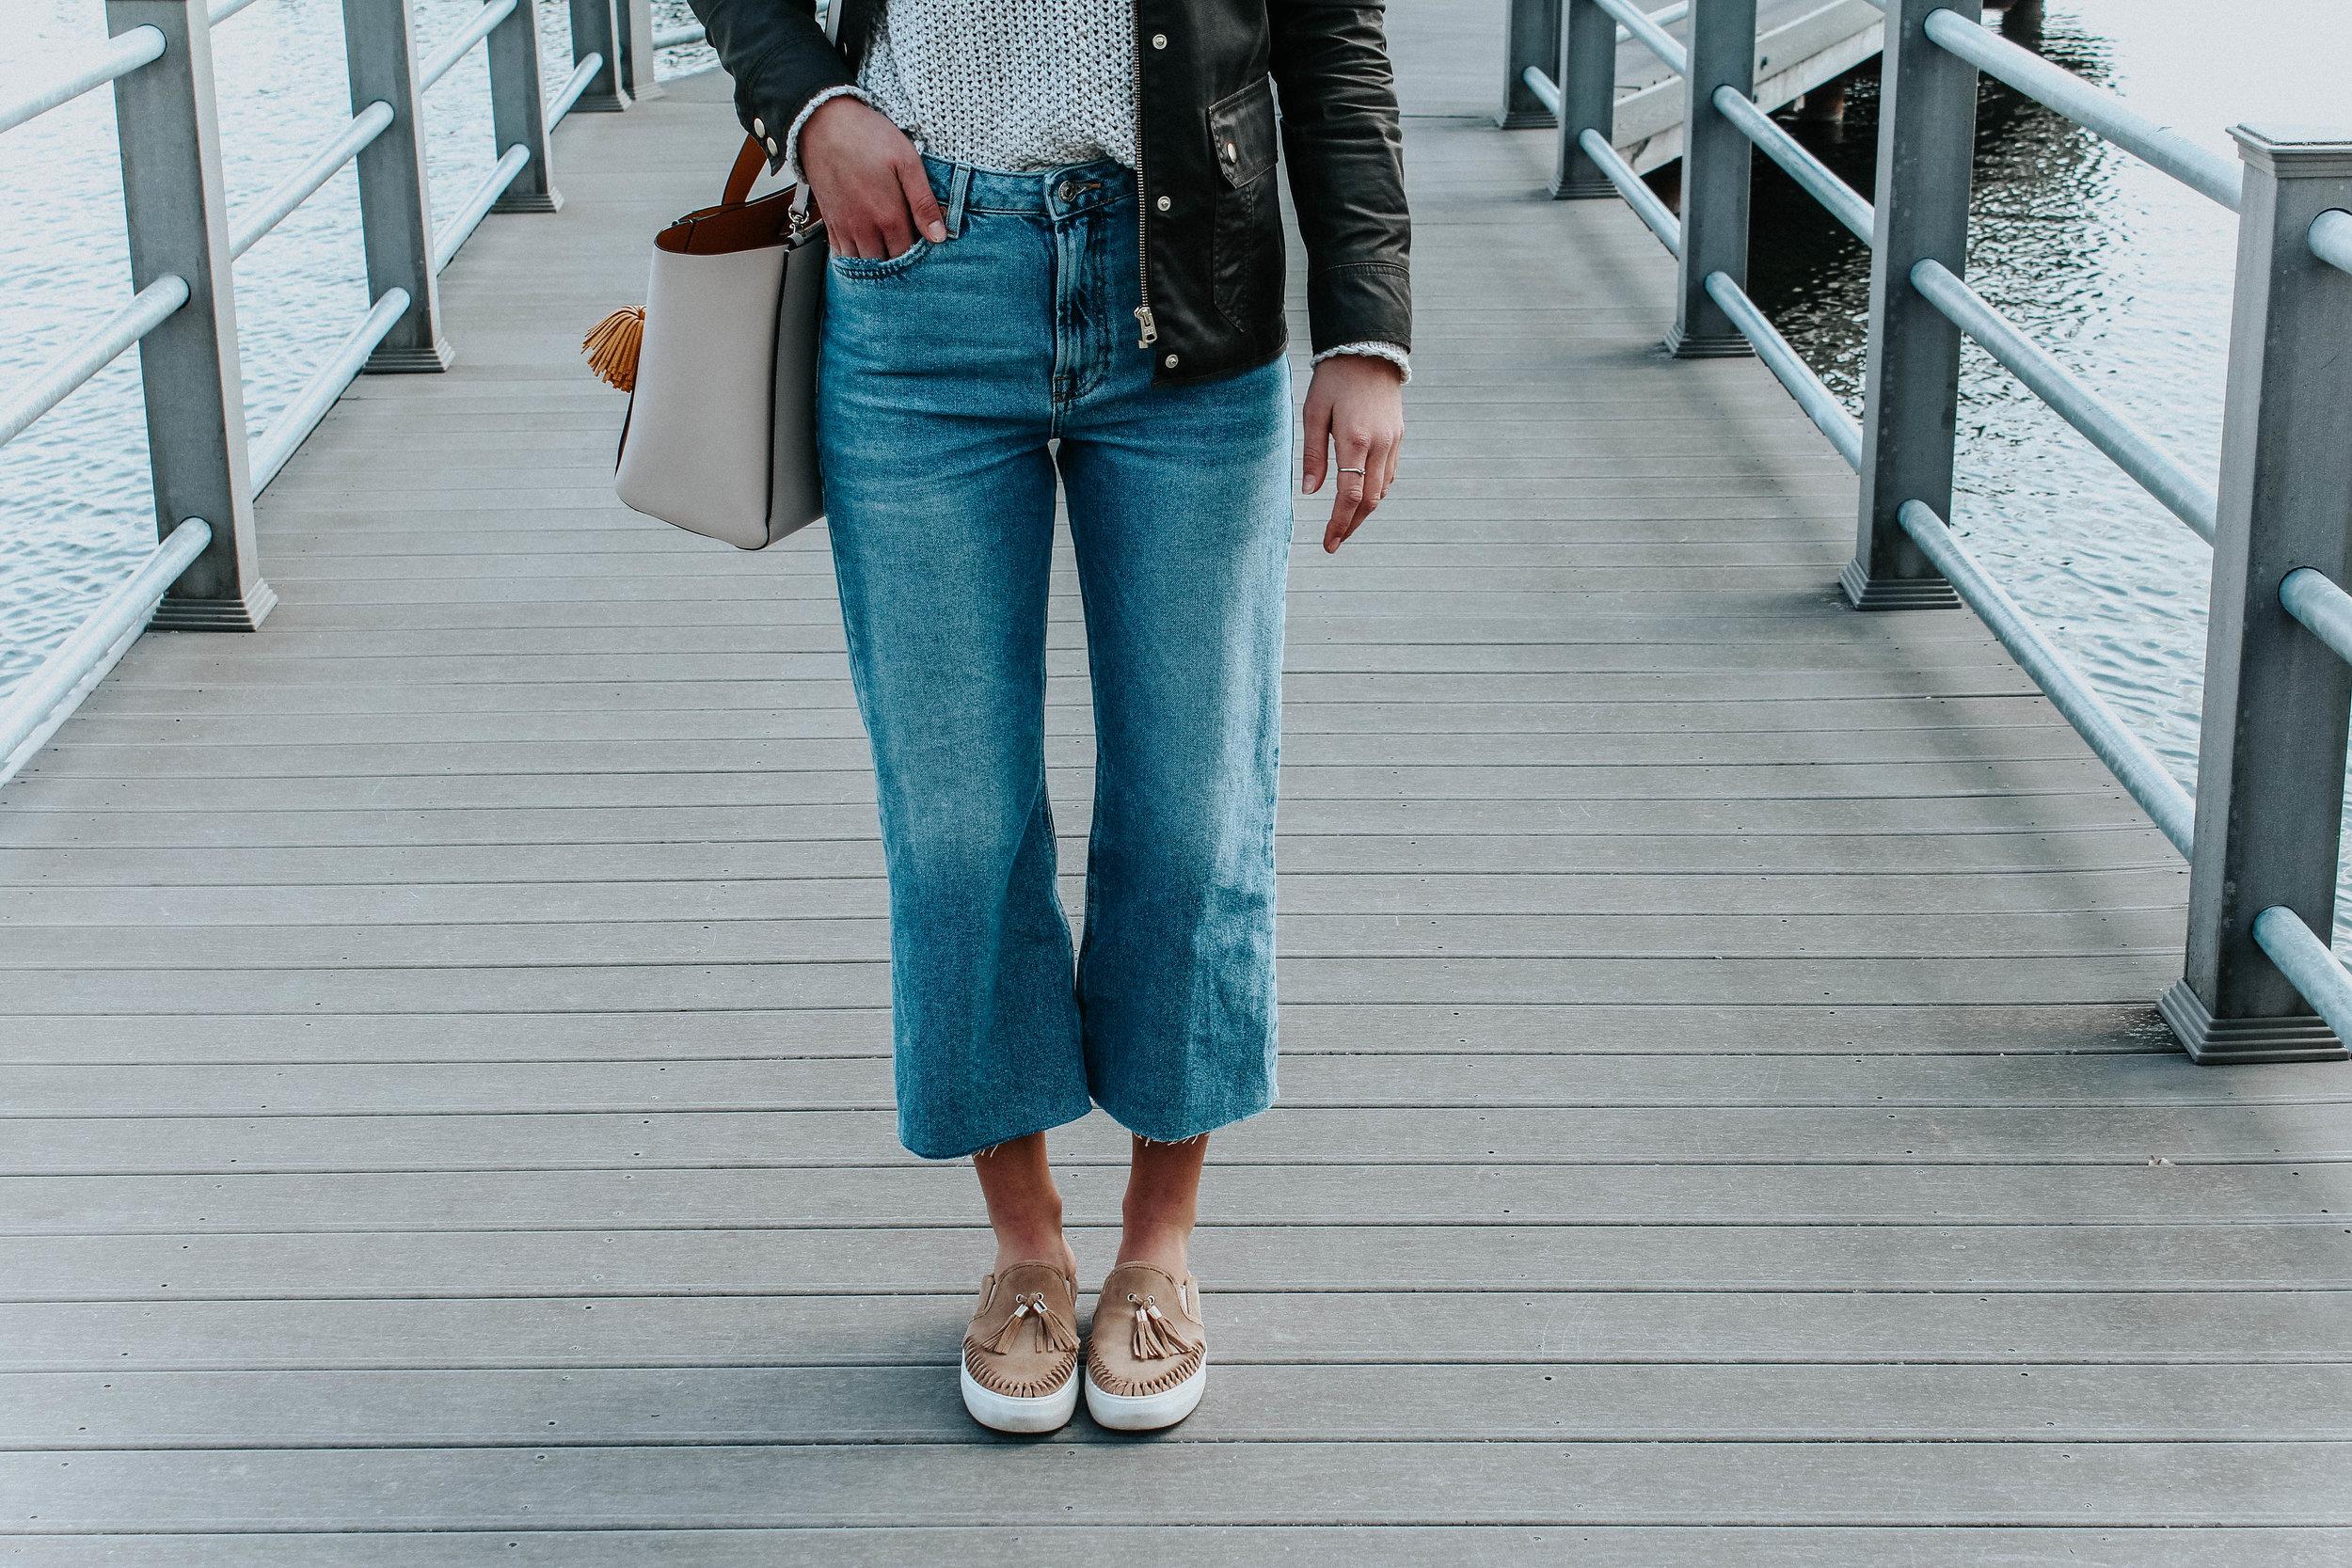 shoes-jeans-jacket.JPG